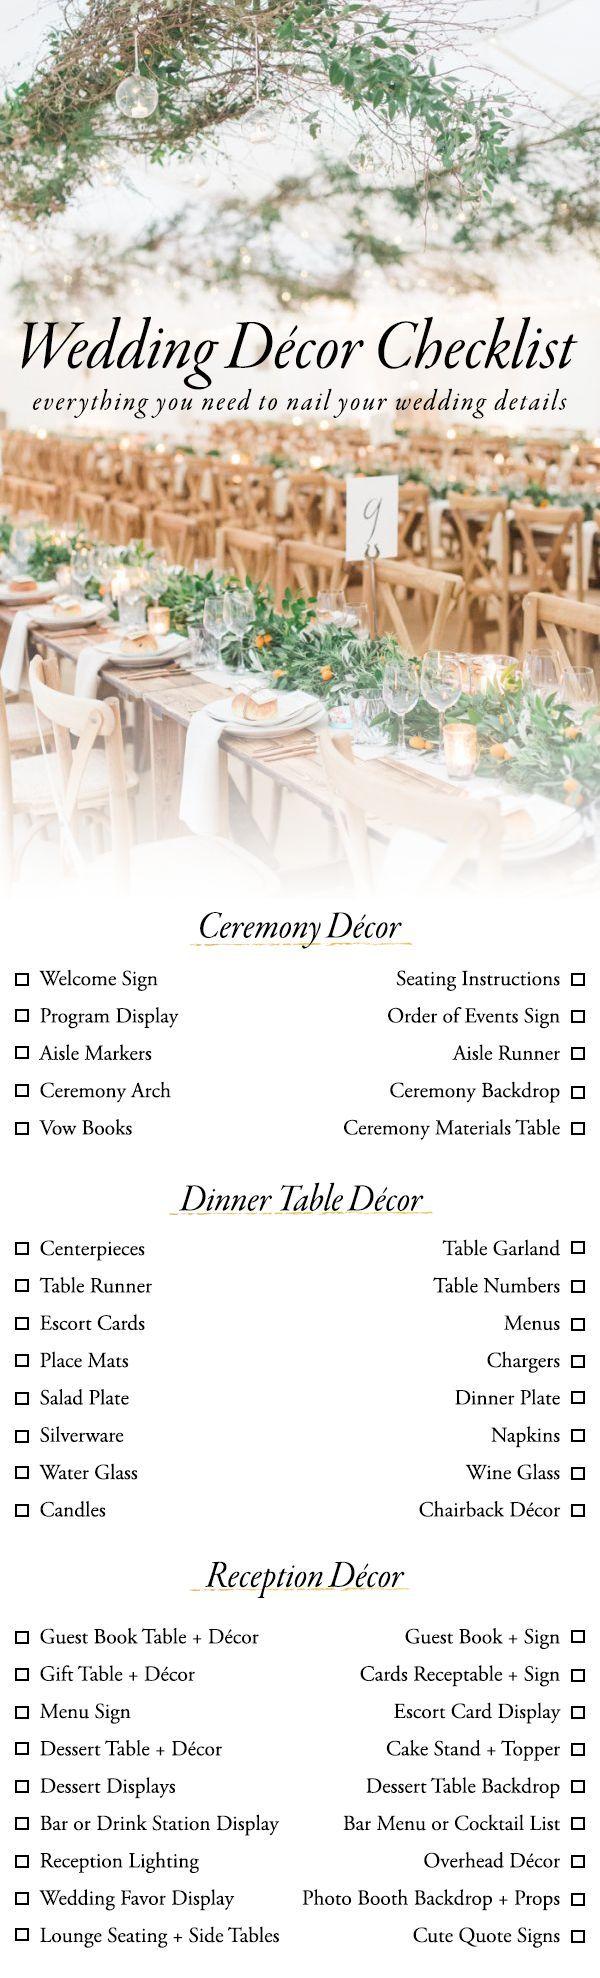 Use This Wedding Decor Checklist to Help You Nail Every Detail | Junebug  Weddings | Wedding planning, Wedding decorations, Backyard wedding